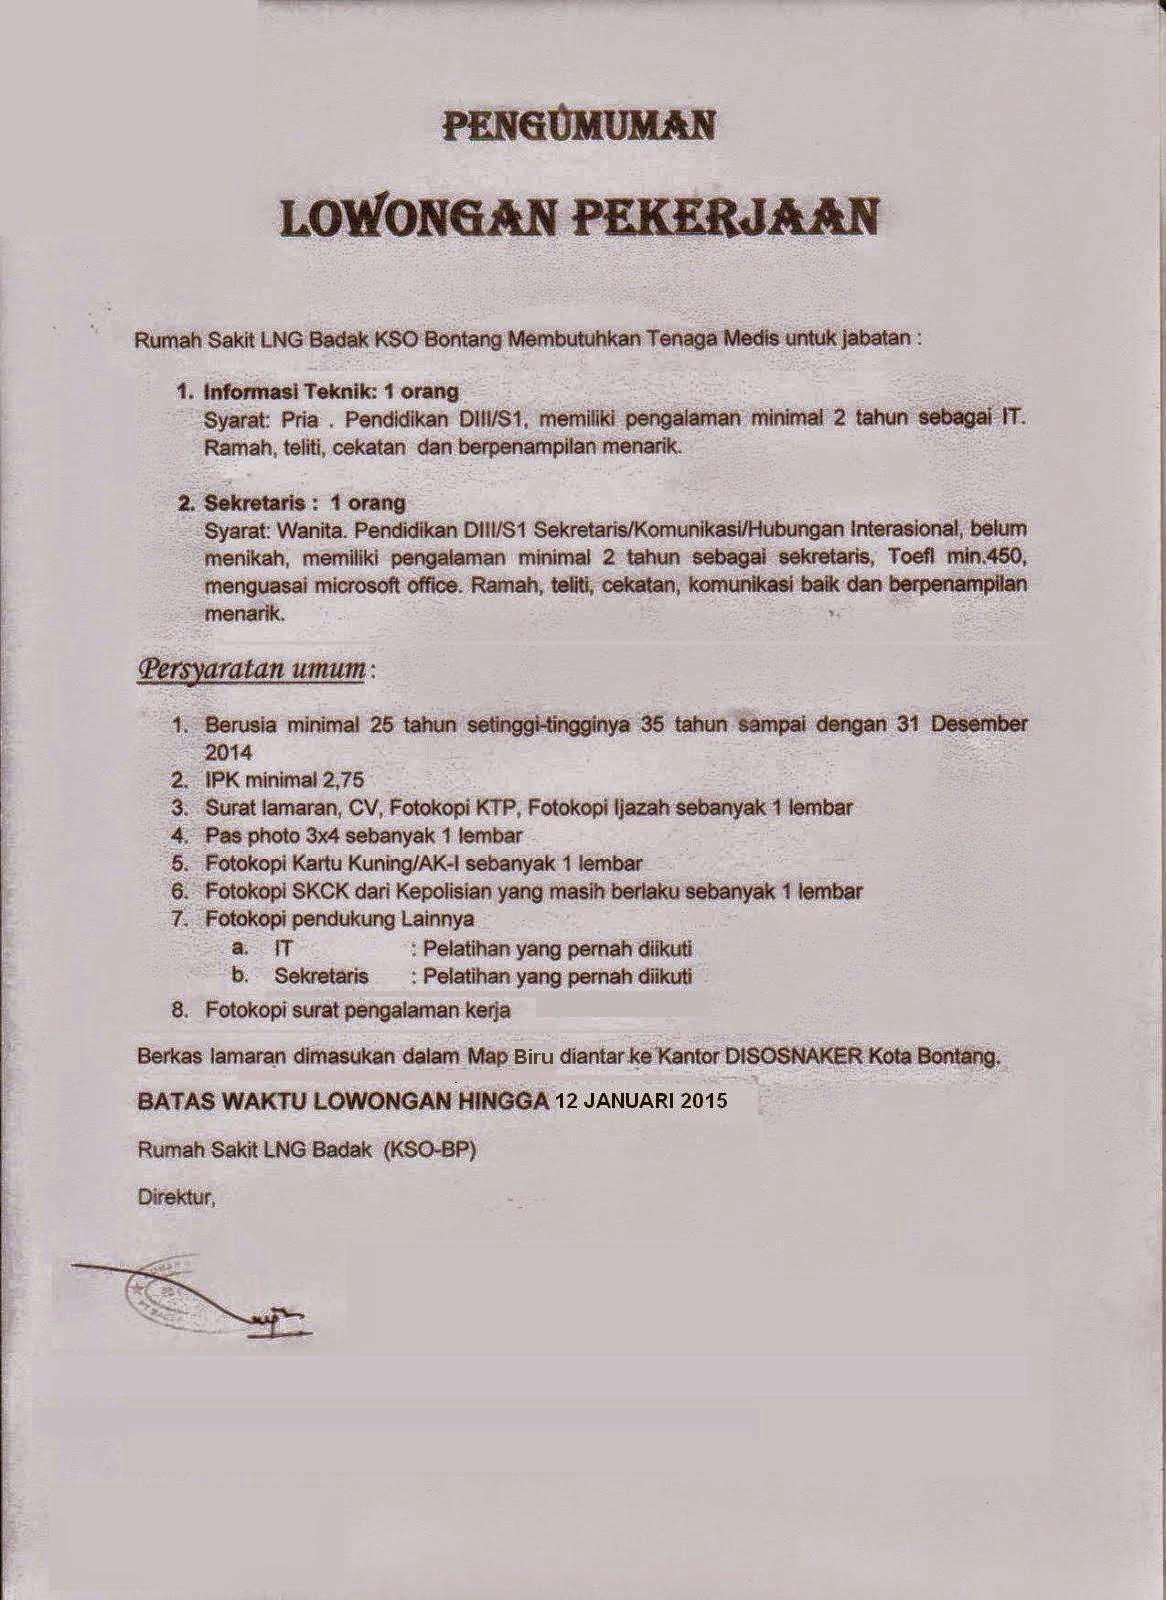 Lowongan Kerja Rumah Sakit LNG Badak KSO Bontang